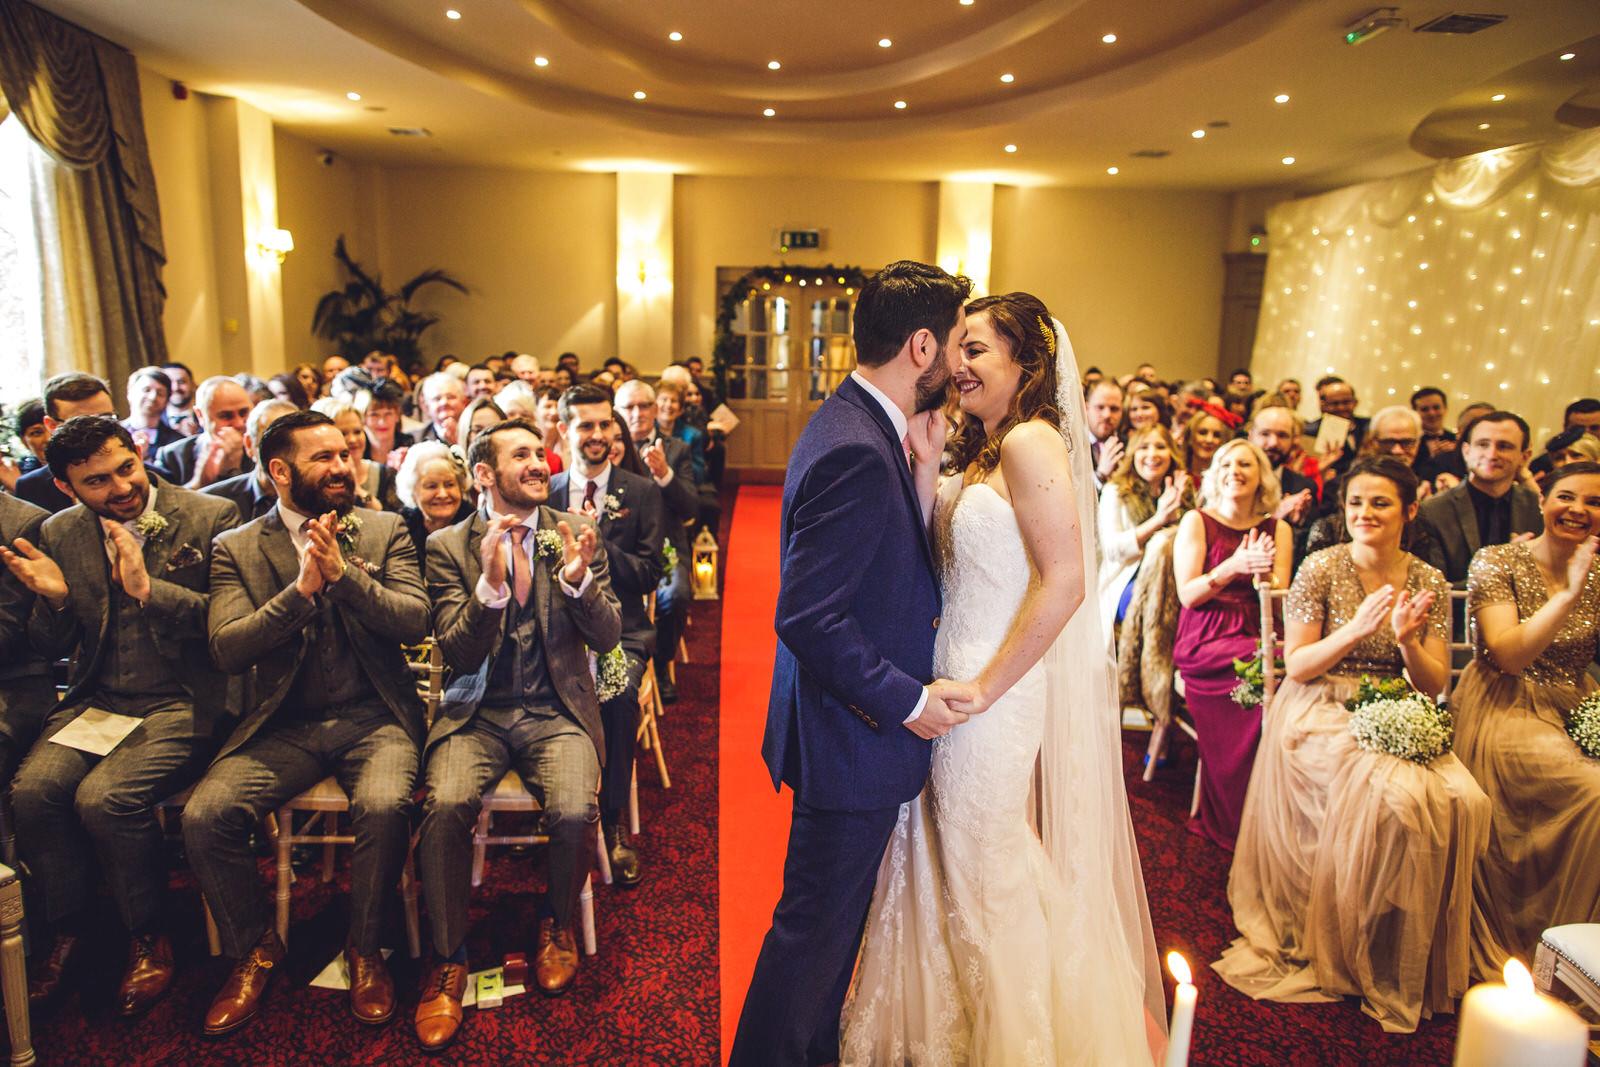 Roger-kenny-wedding-photographer-greystones-wicklow-dublin_048.jpg